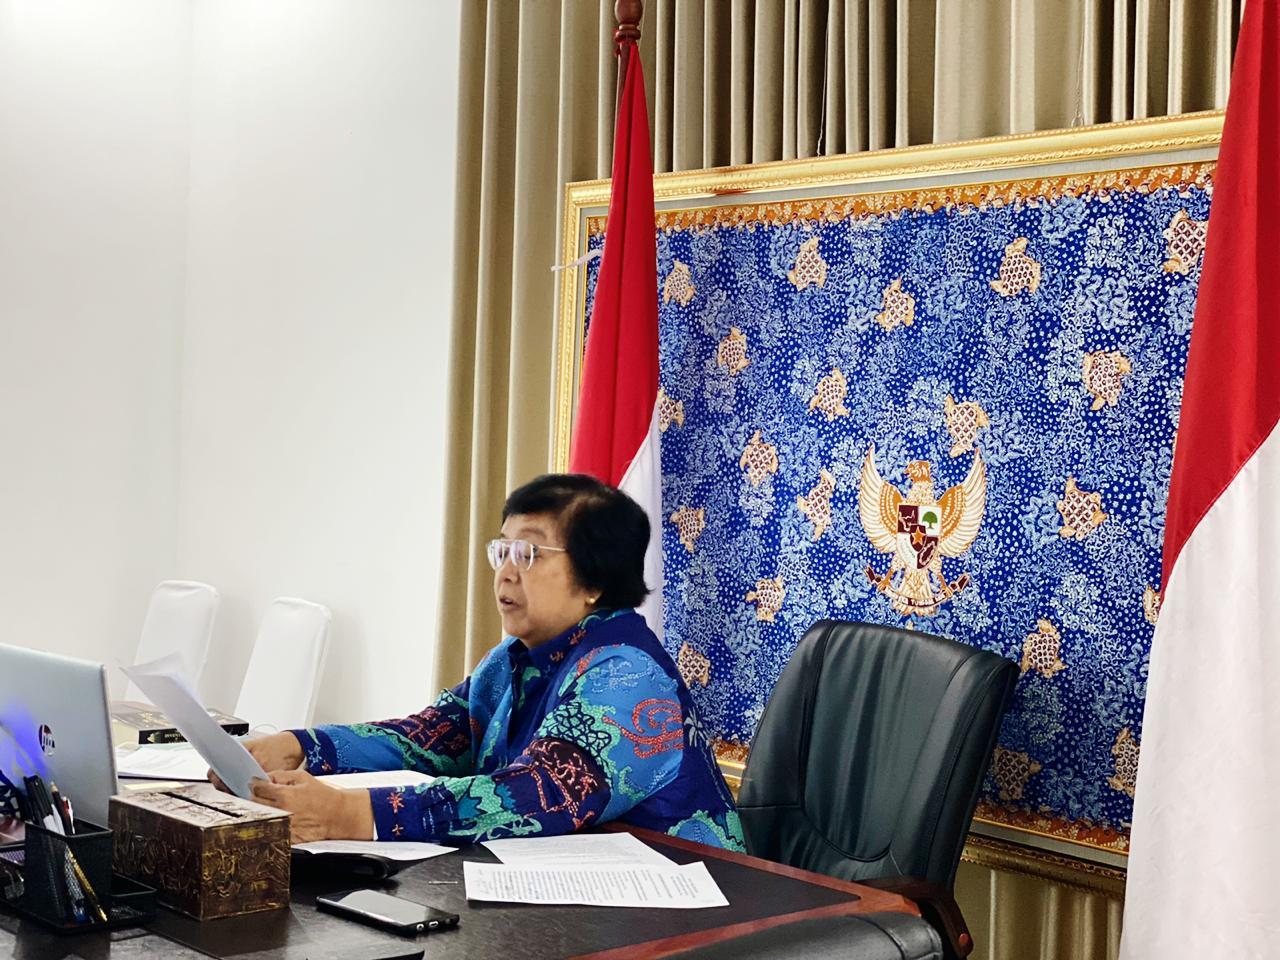 https: img.okezone.com content 2020 05 23 1 2218348 sofo-2020-deforestasi-indonesia-turun-tajam-komitmen-pemerintahan-jokowi-lindungi-keanekaragaman-hayati-aLBBeyxSwg.jpg